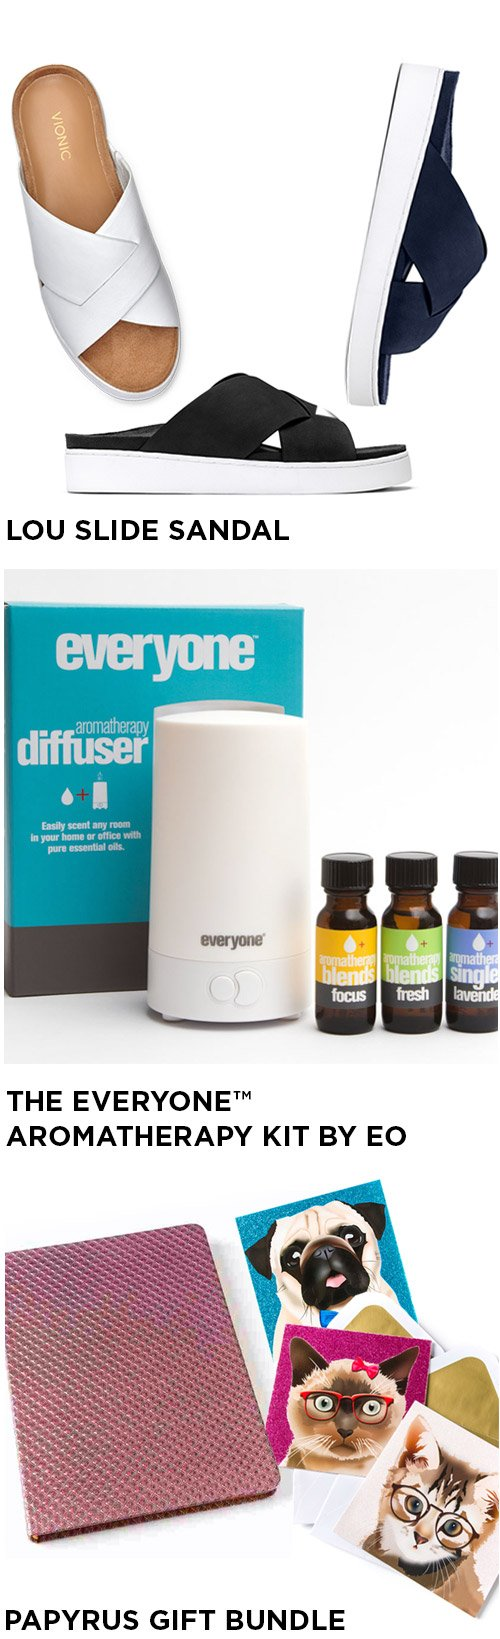 Vionic Joy - Secret Giveaway